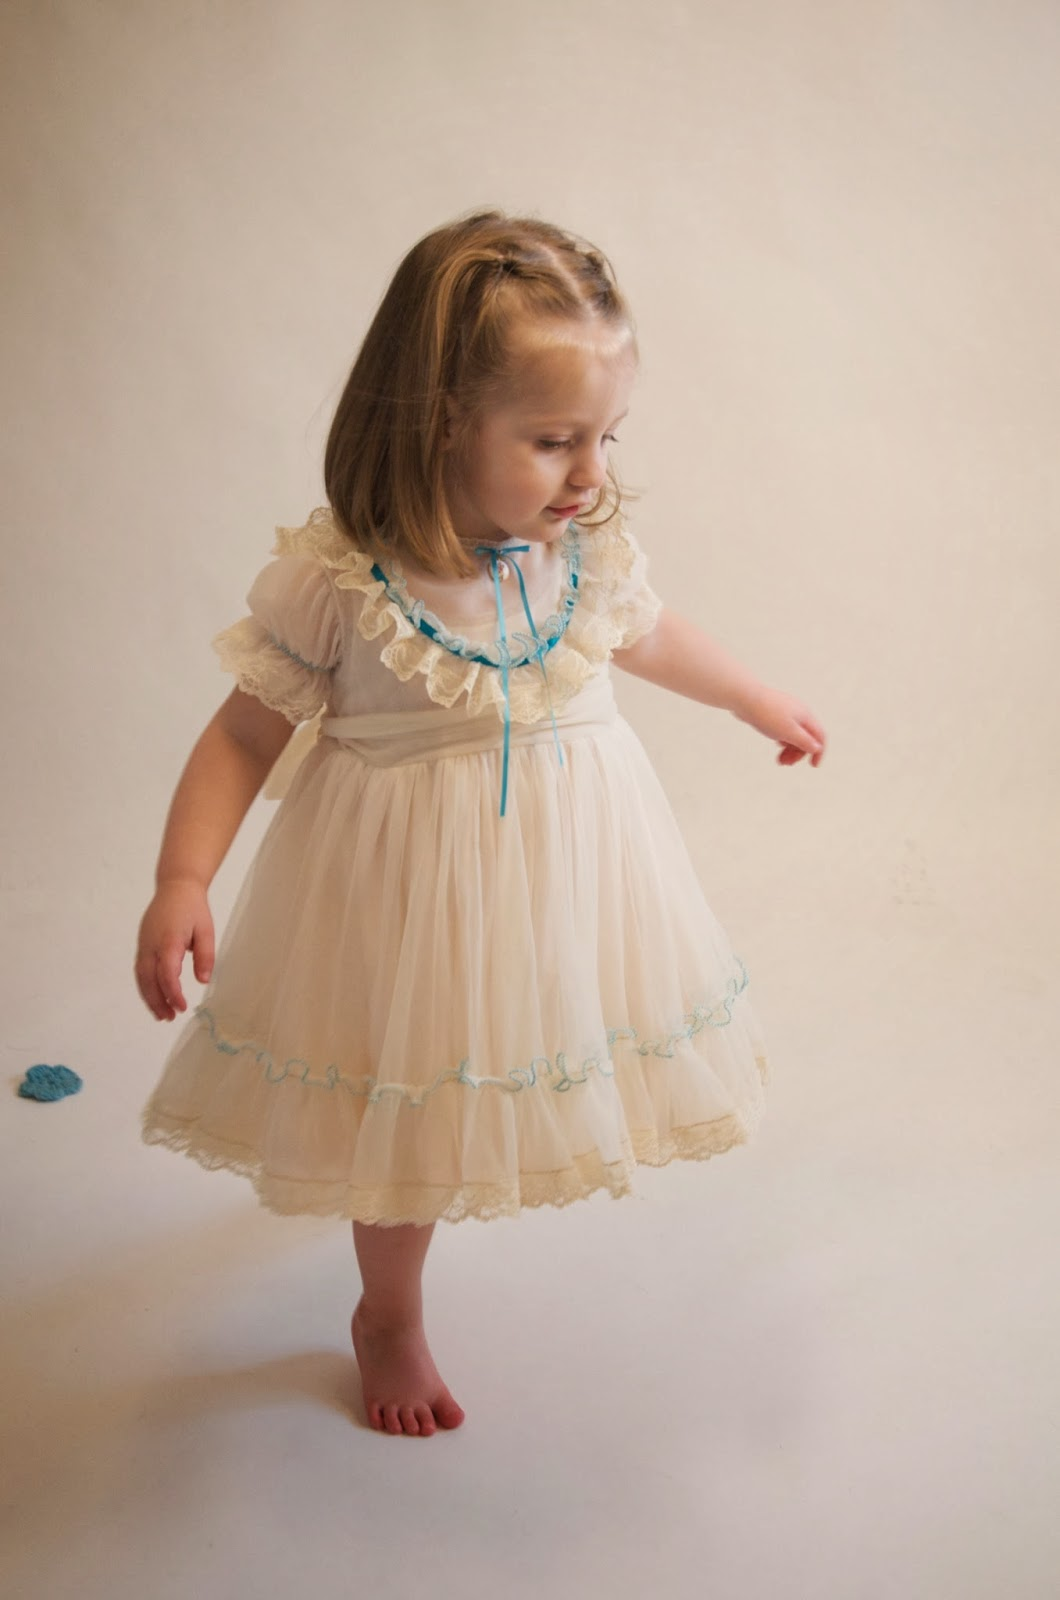 kids dress, kid dress, girls dresses, girls dress, girls baptism dress, girls party dress, little girl,